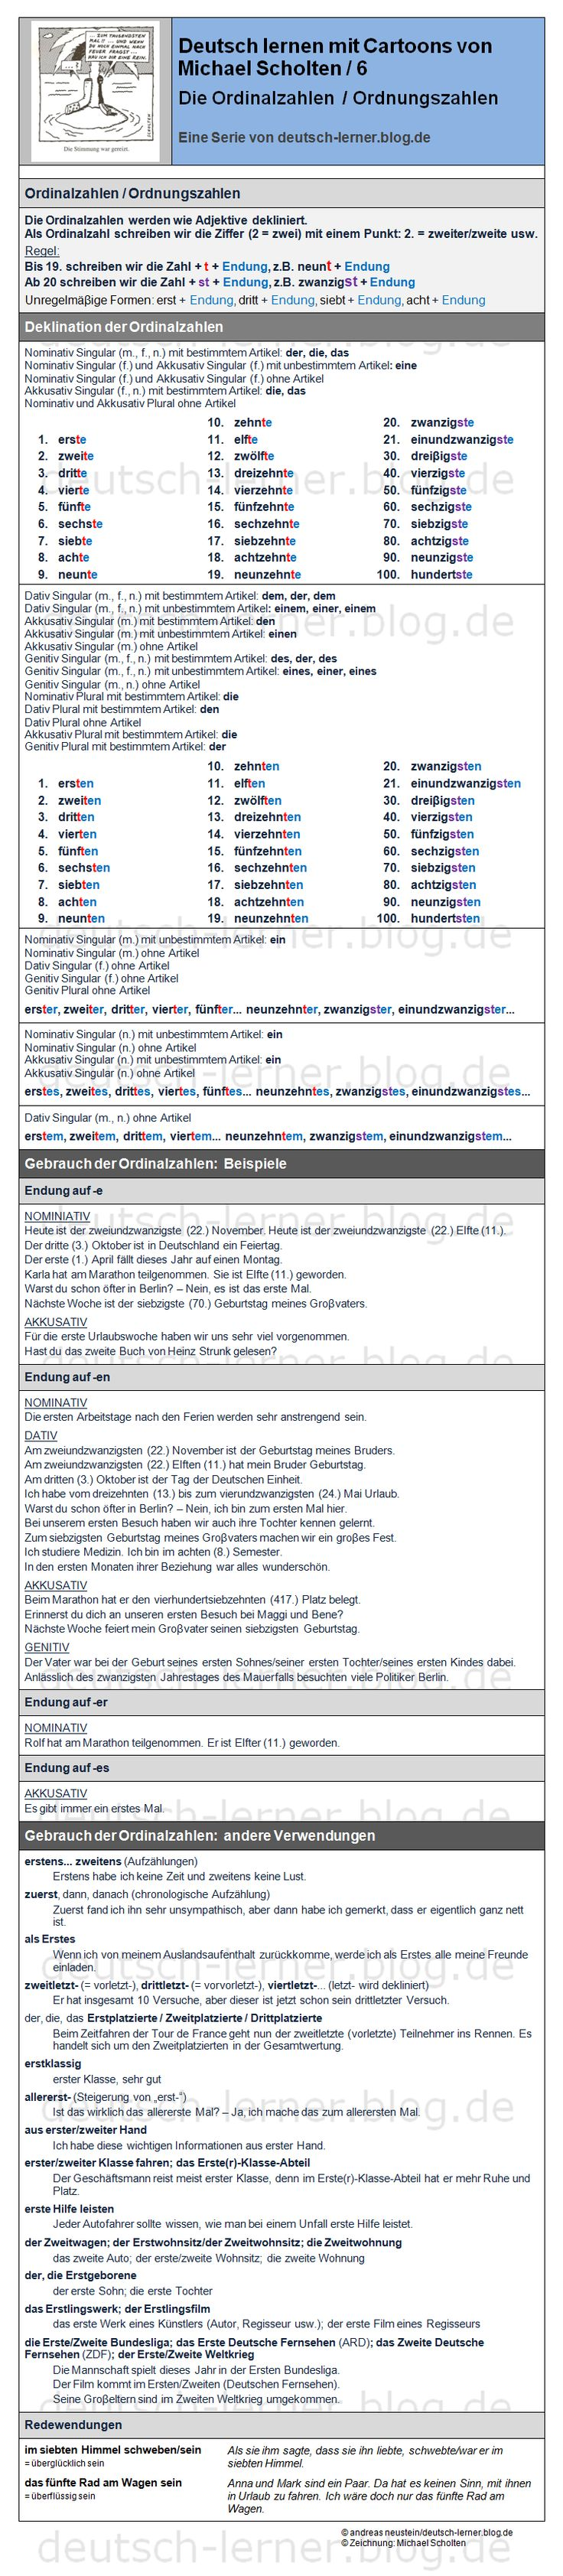 Beste Ordnungszahlen Arbeitsblatt Kindergarten Ideen - Super Lehrer ...